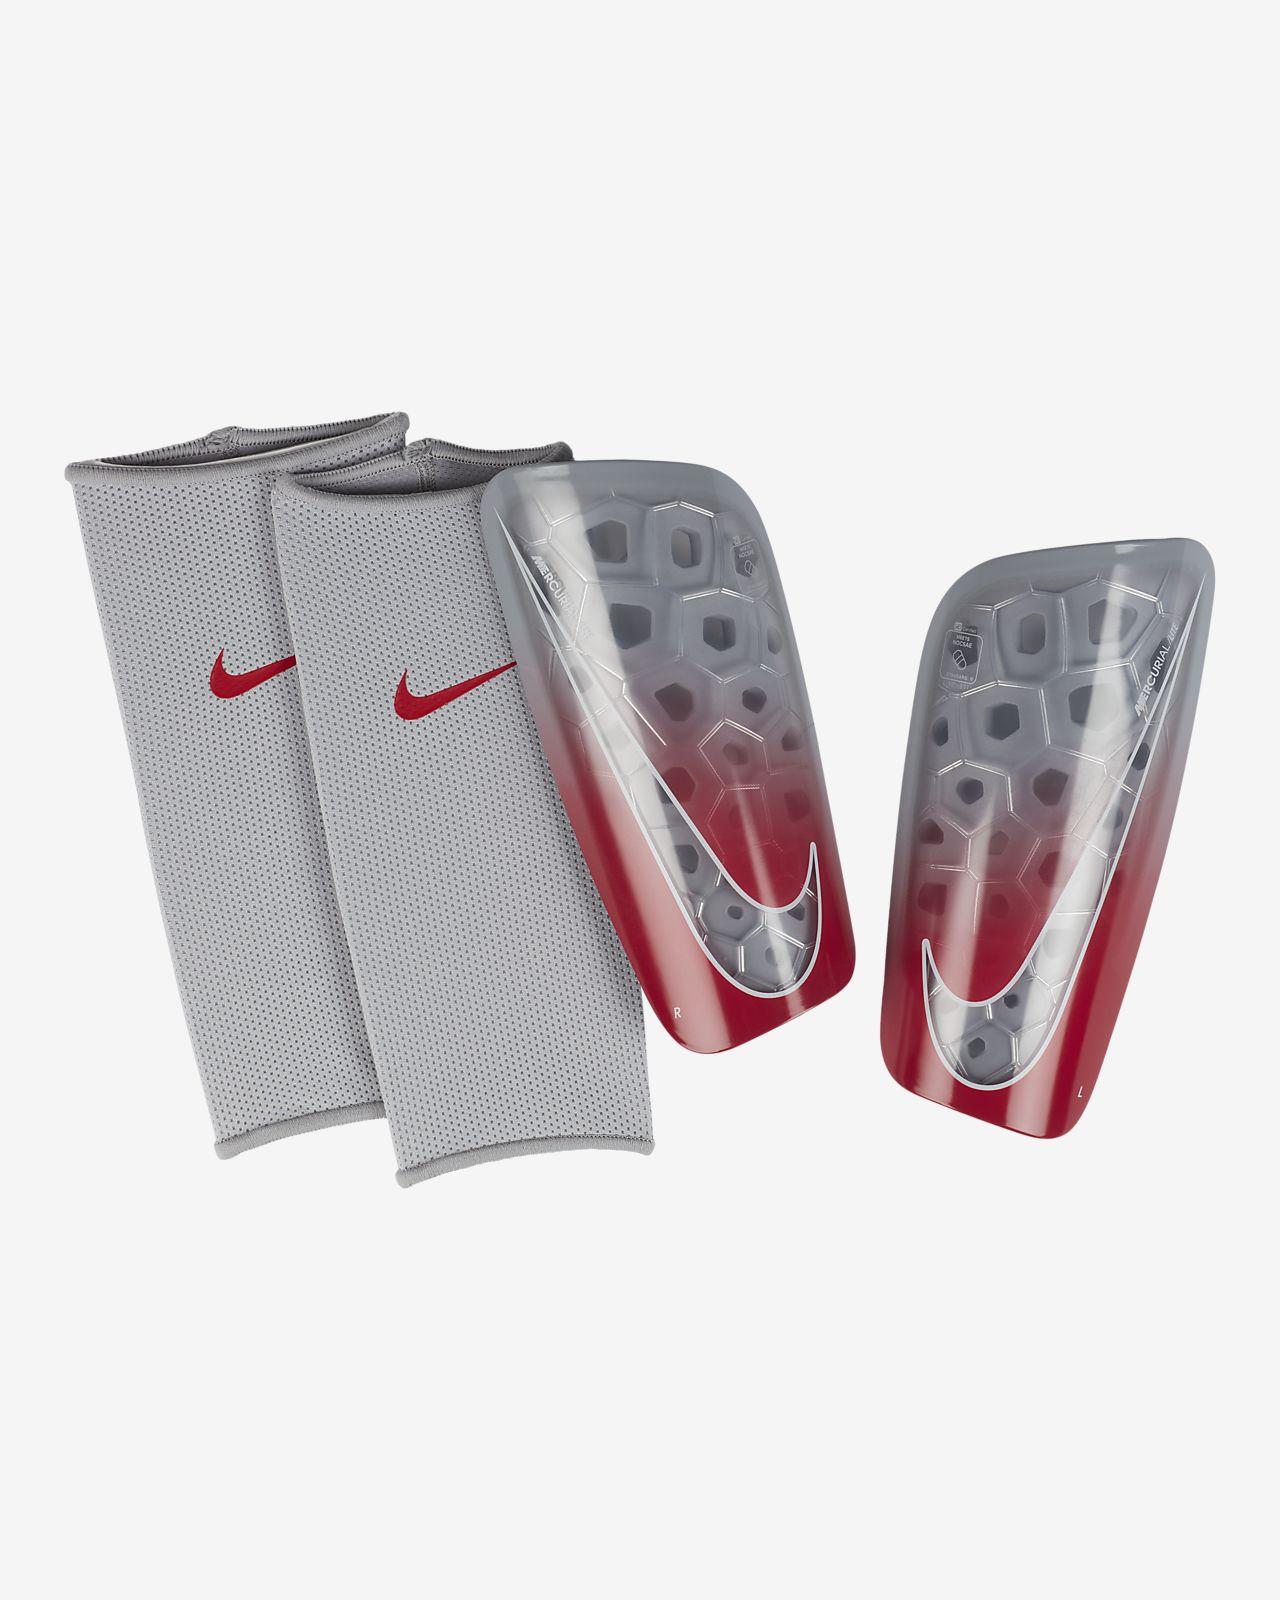 d7858c1cd01 Football Nike MERCURIAL LITE CR7 RONALDO CALCIO Parastinchi Shin Pads BLACK  Crimson Red Shinpads